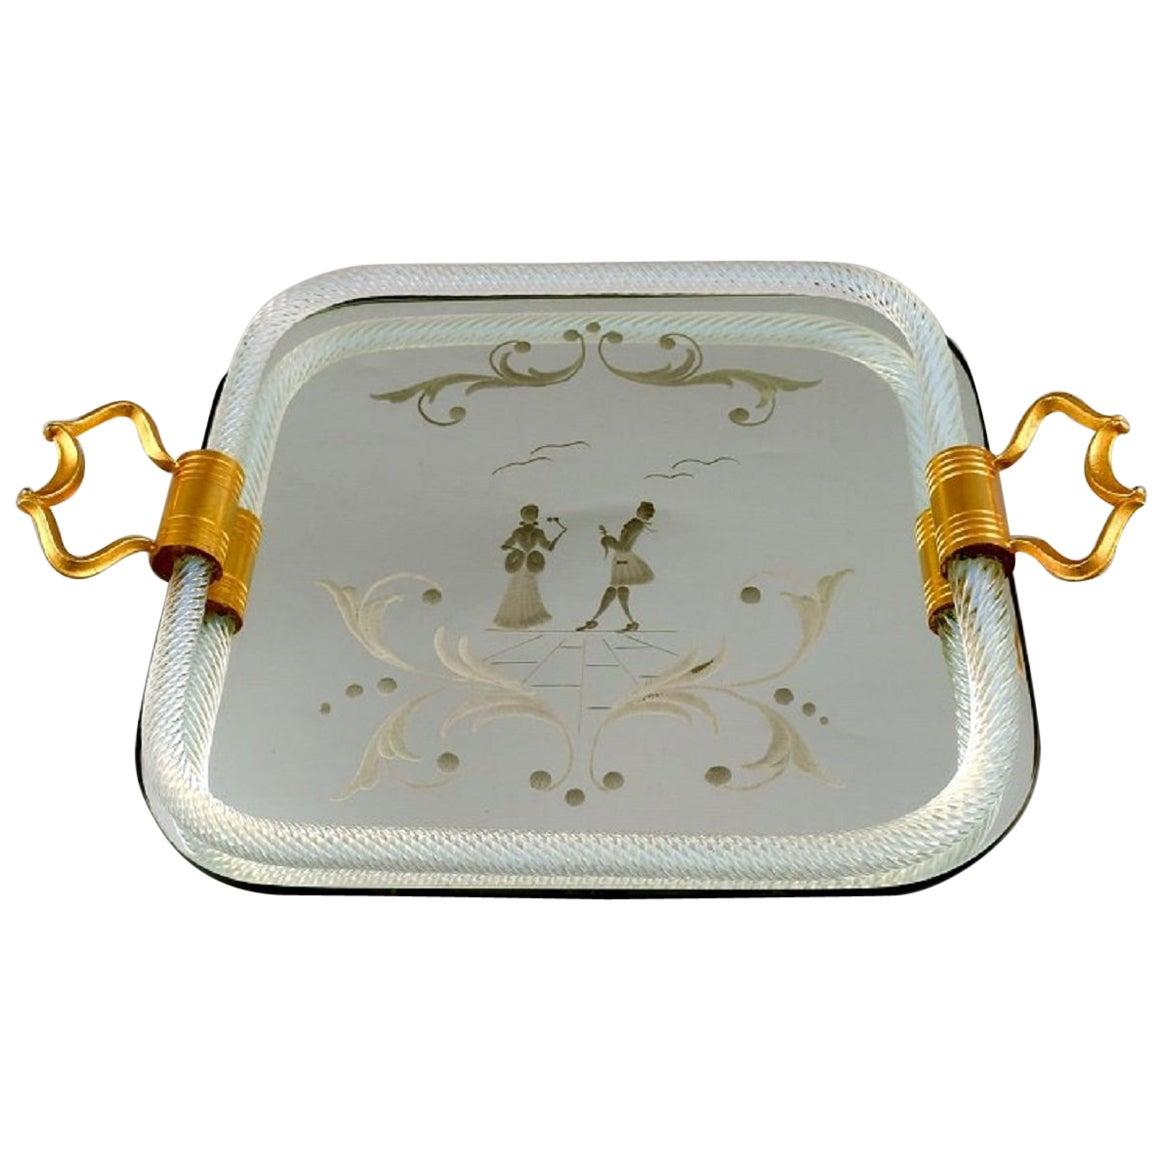 Murano, Italy, Rectangular Tray with Mirrored Plate